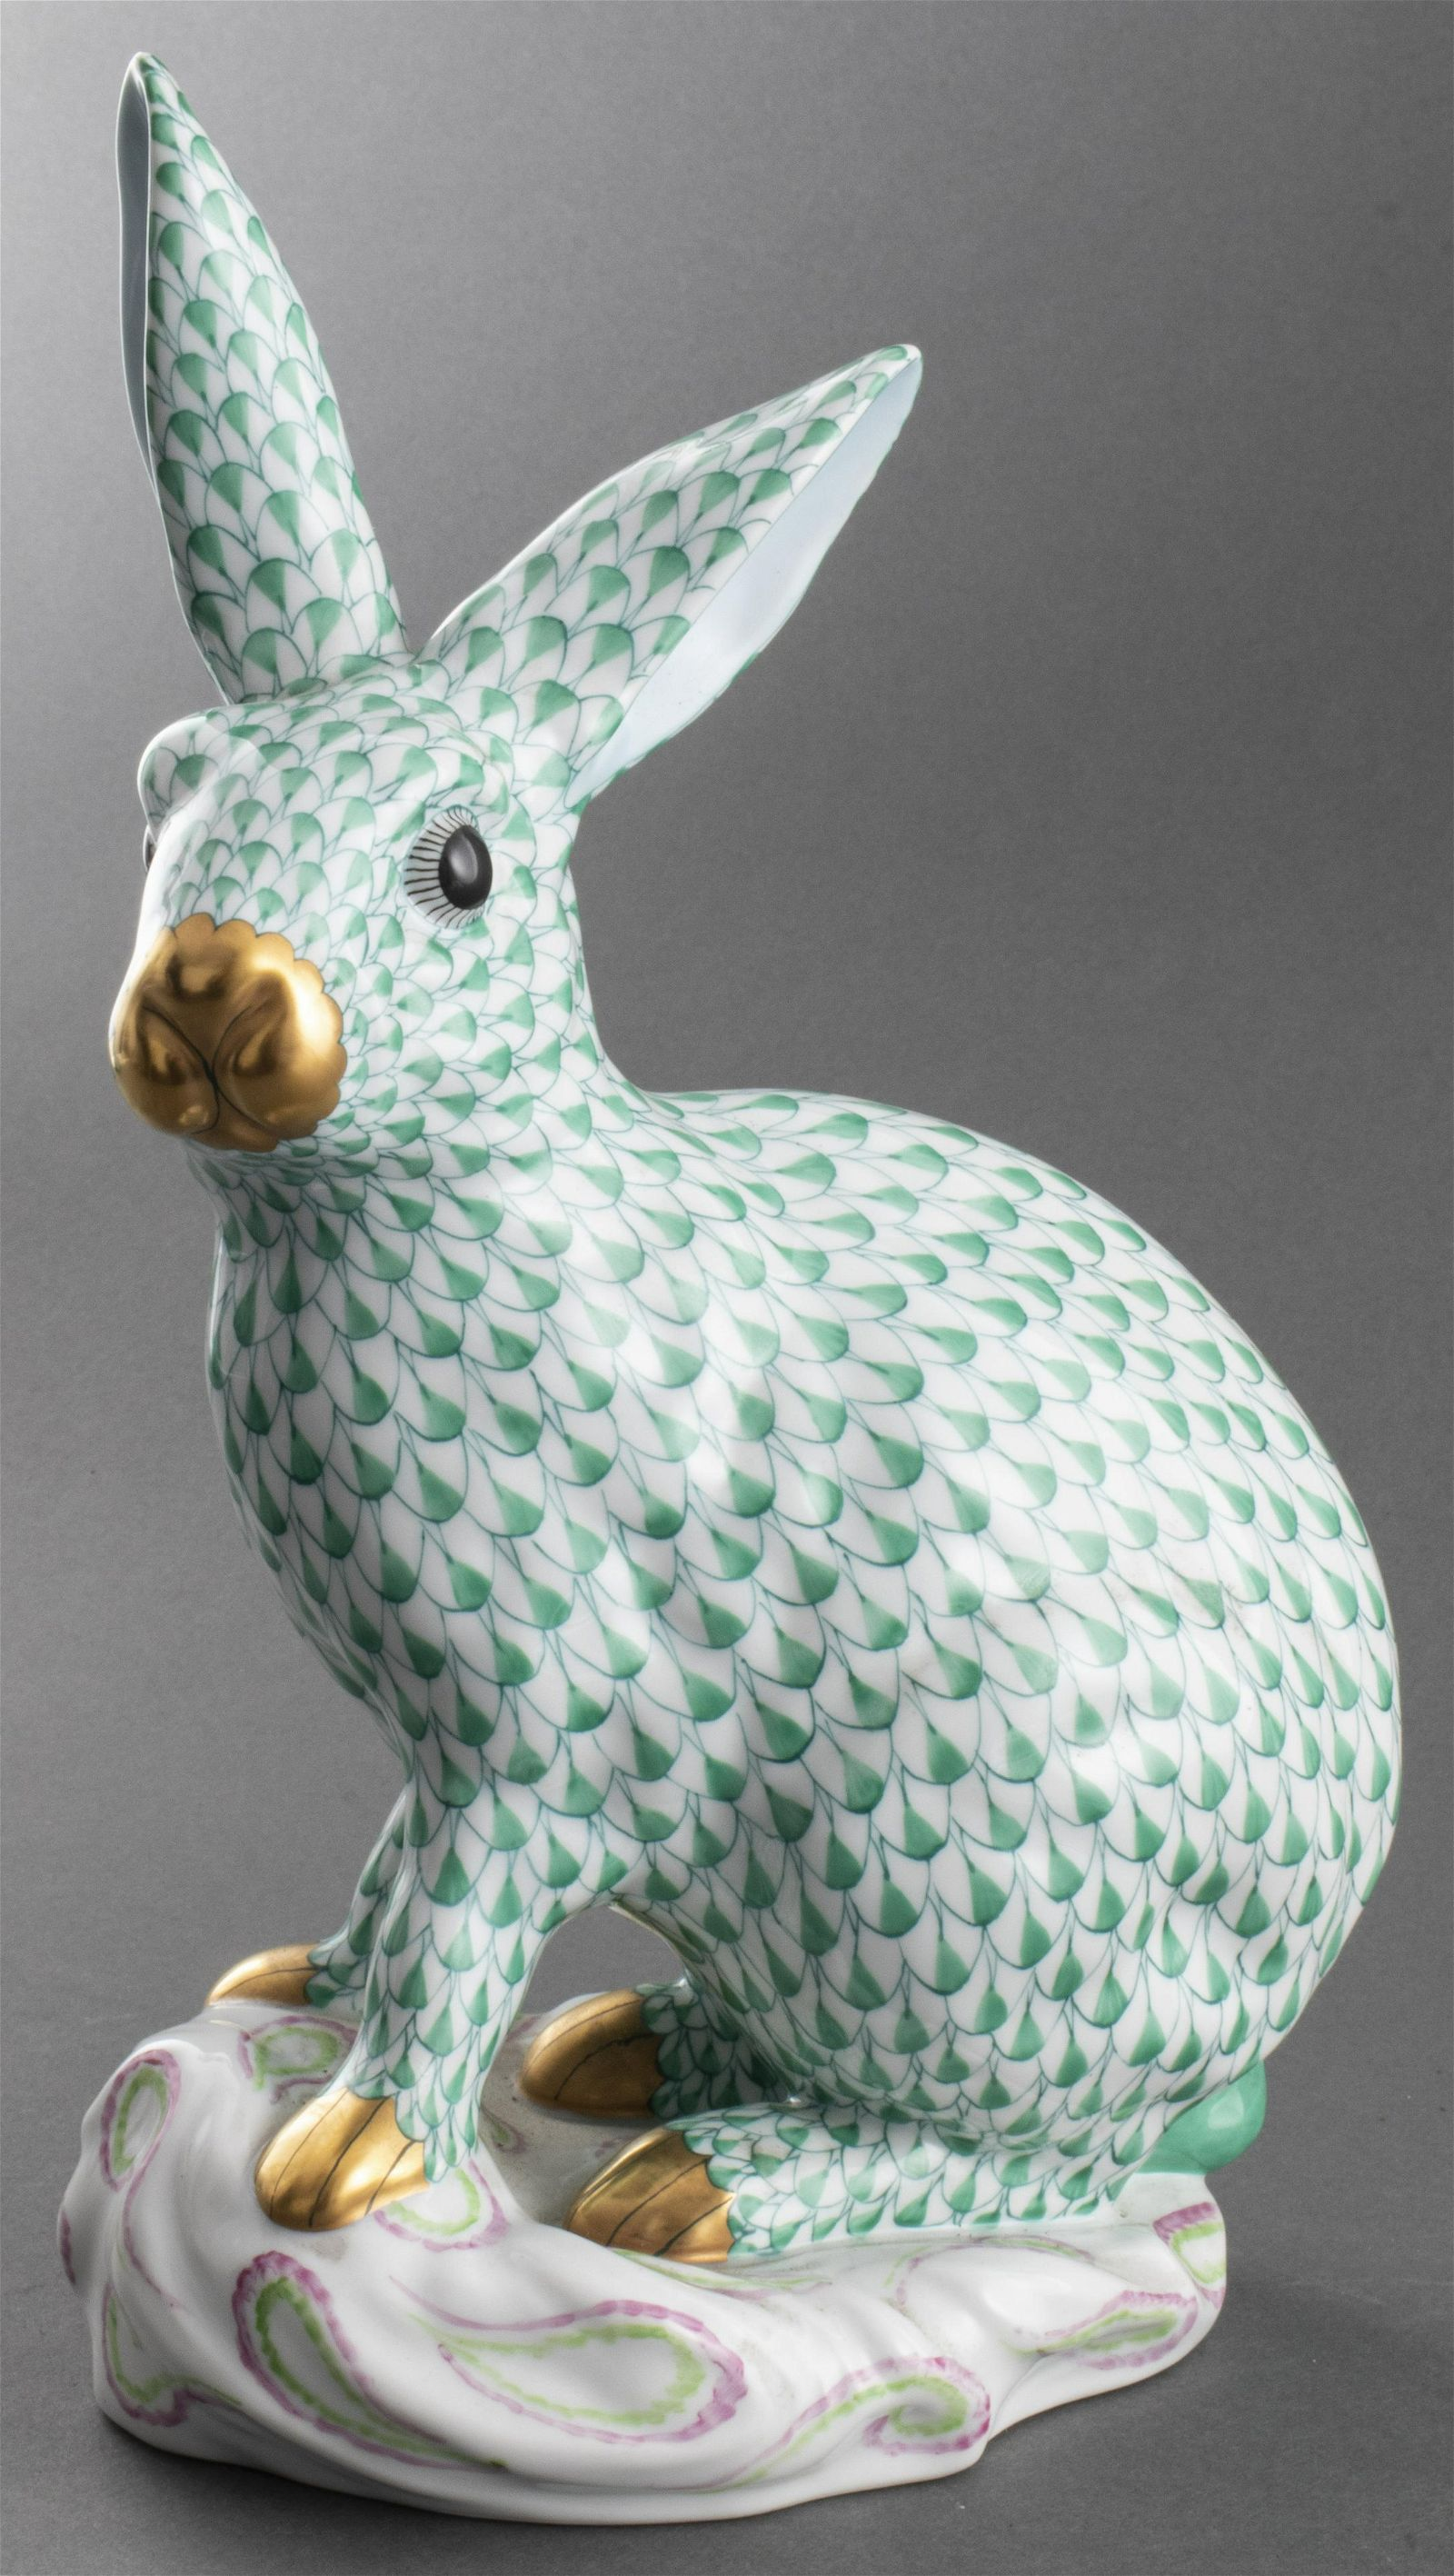 Herend Porcelain Large Rabbit Sculpture